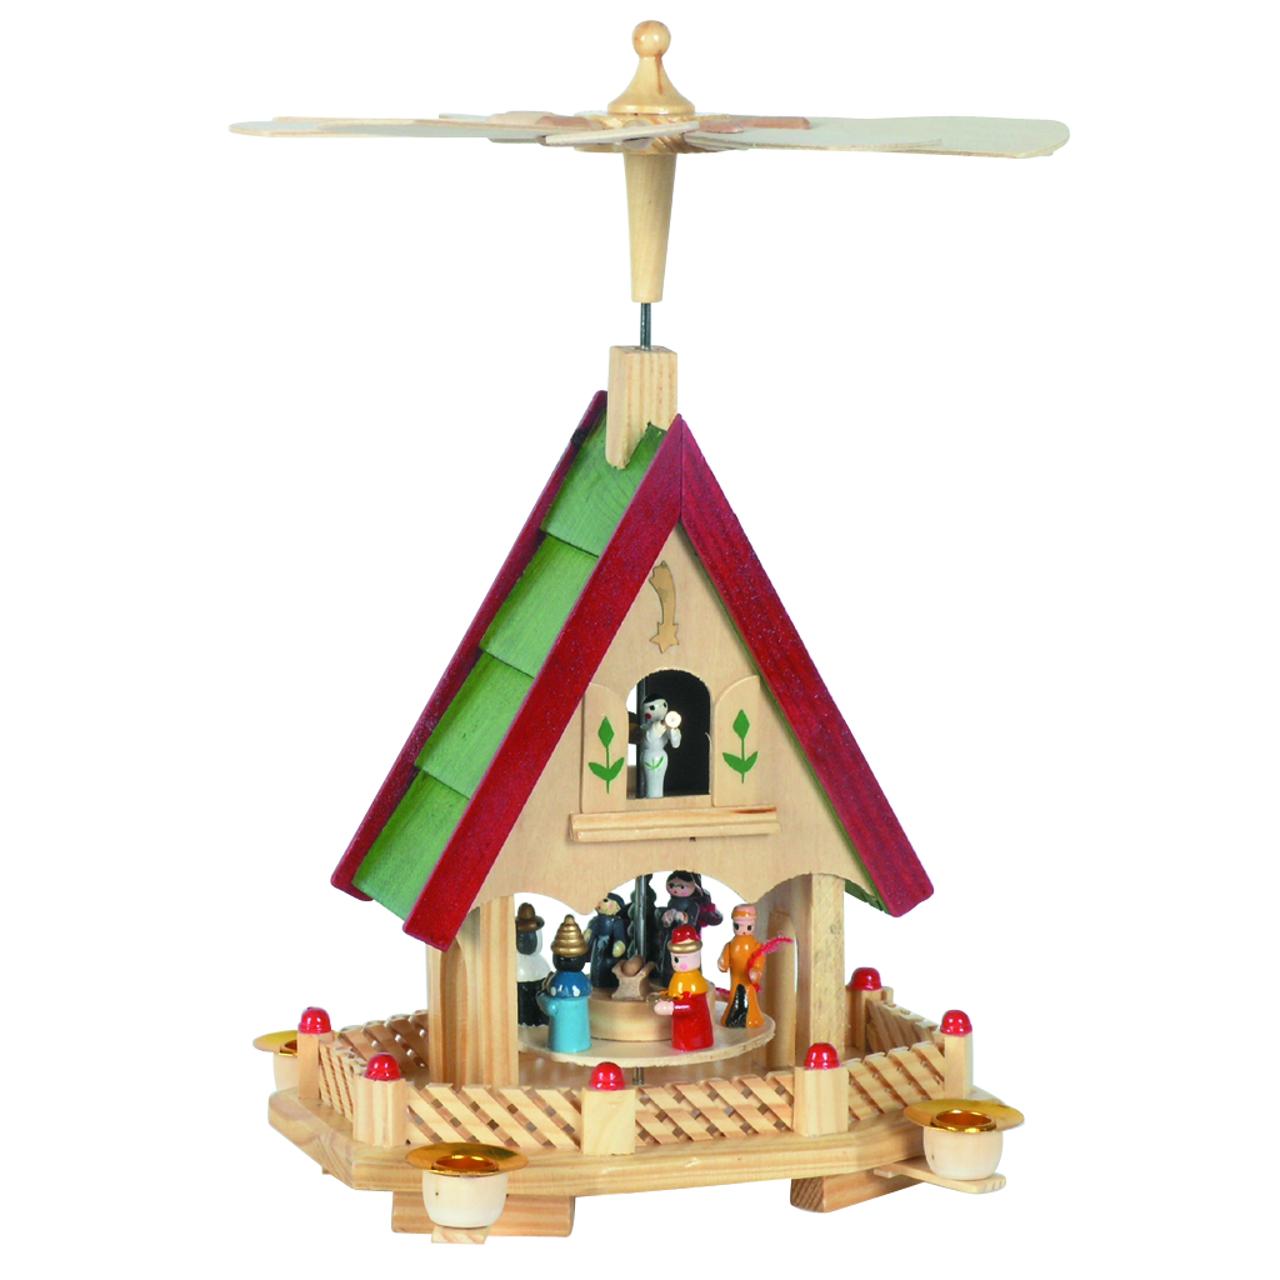 weihnachts pyramide in hausform krippenszene. Black Bedroom Furniture Sets. Home Design Ideas